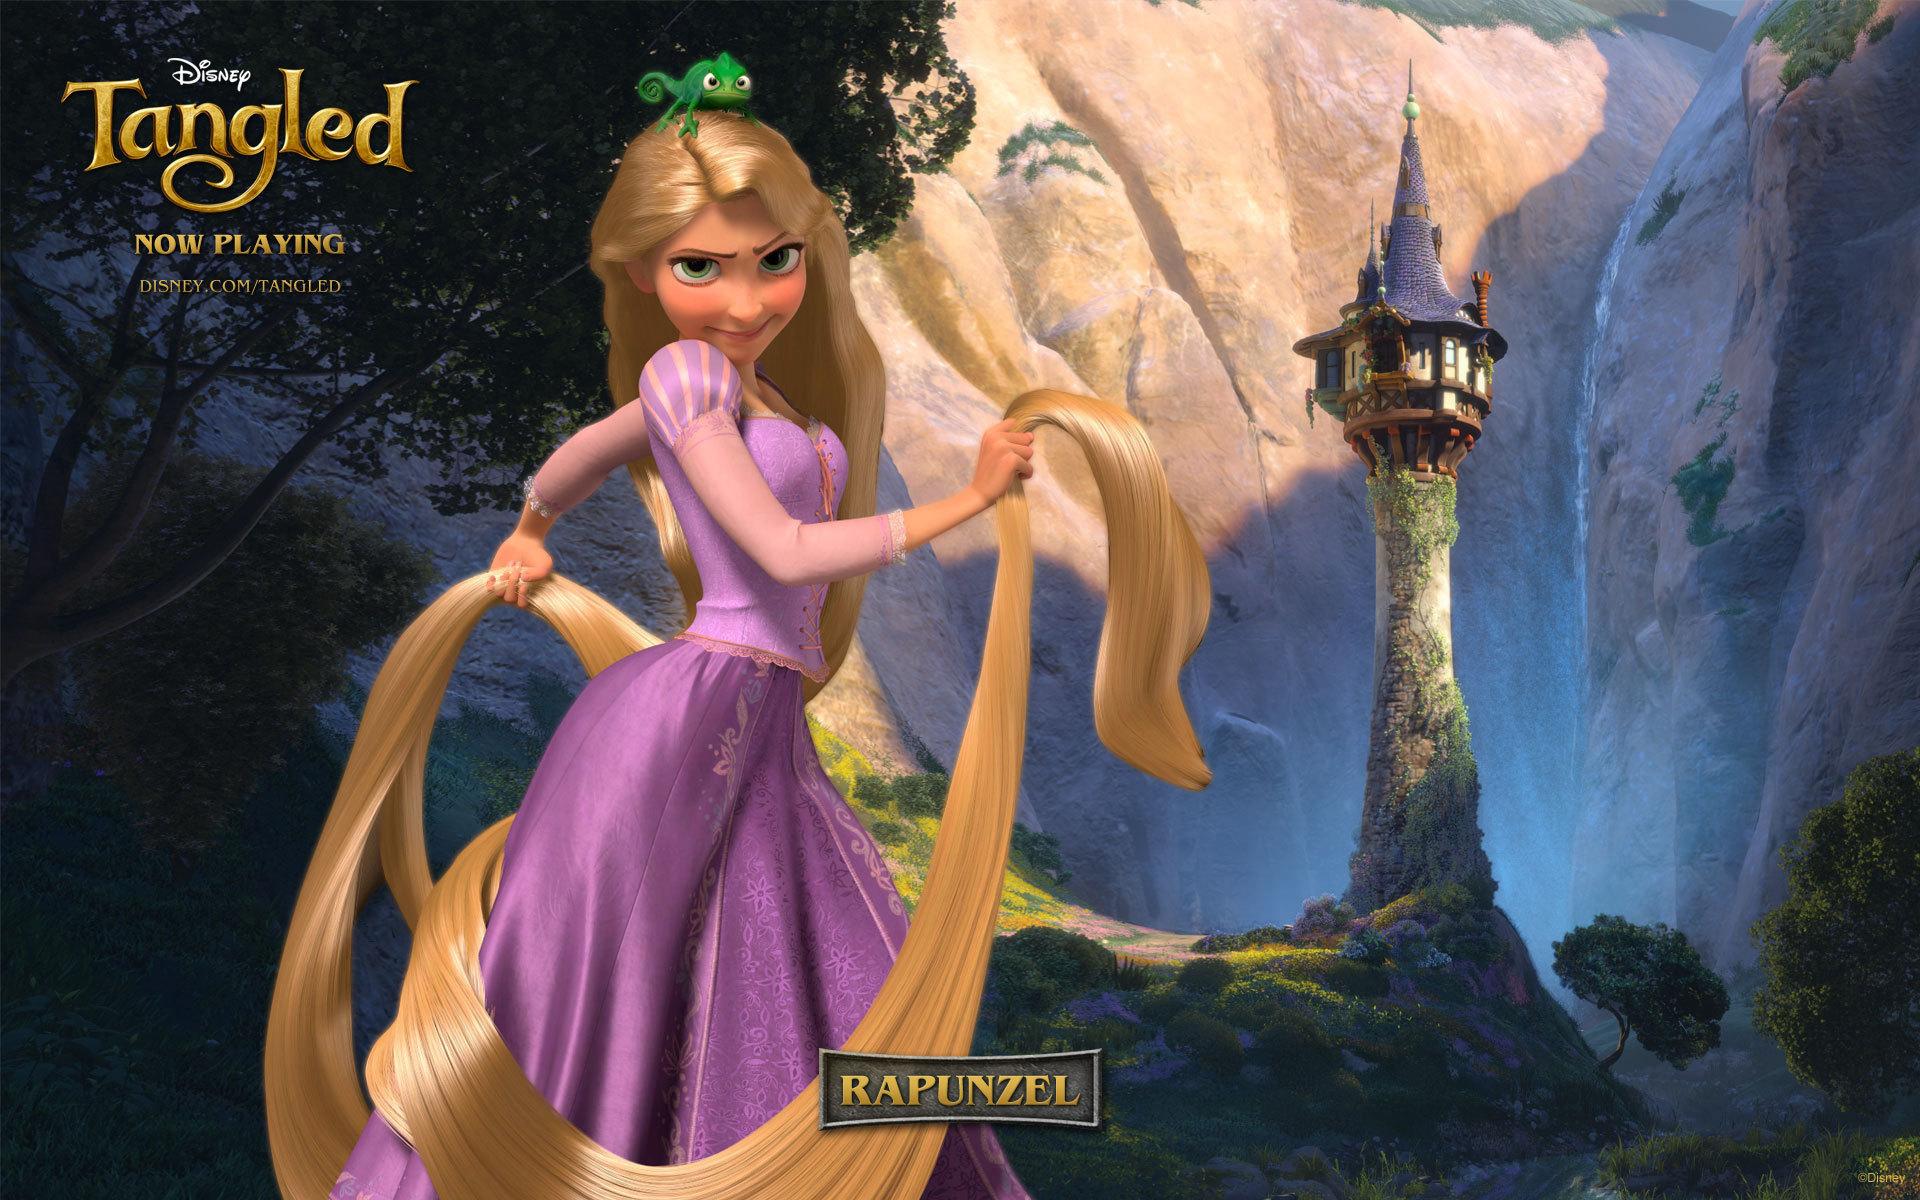 Princess Rapunzel Images Wallpaper 2 HD And Background Photos